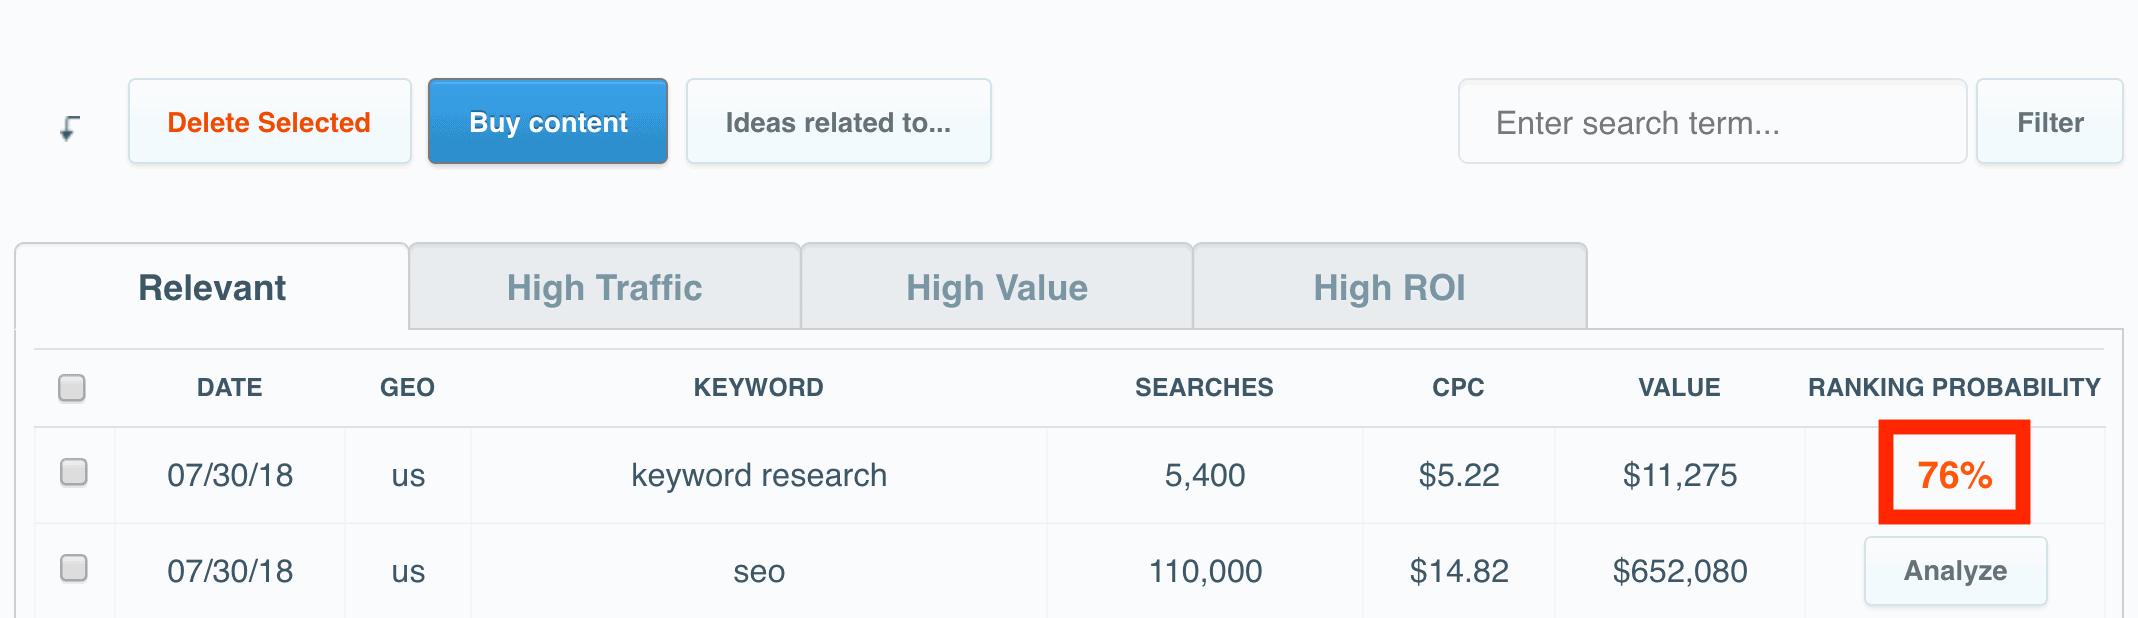 CanIRank – Keyword probability